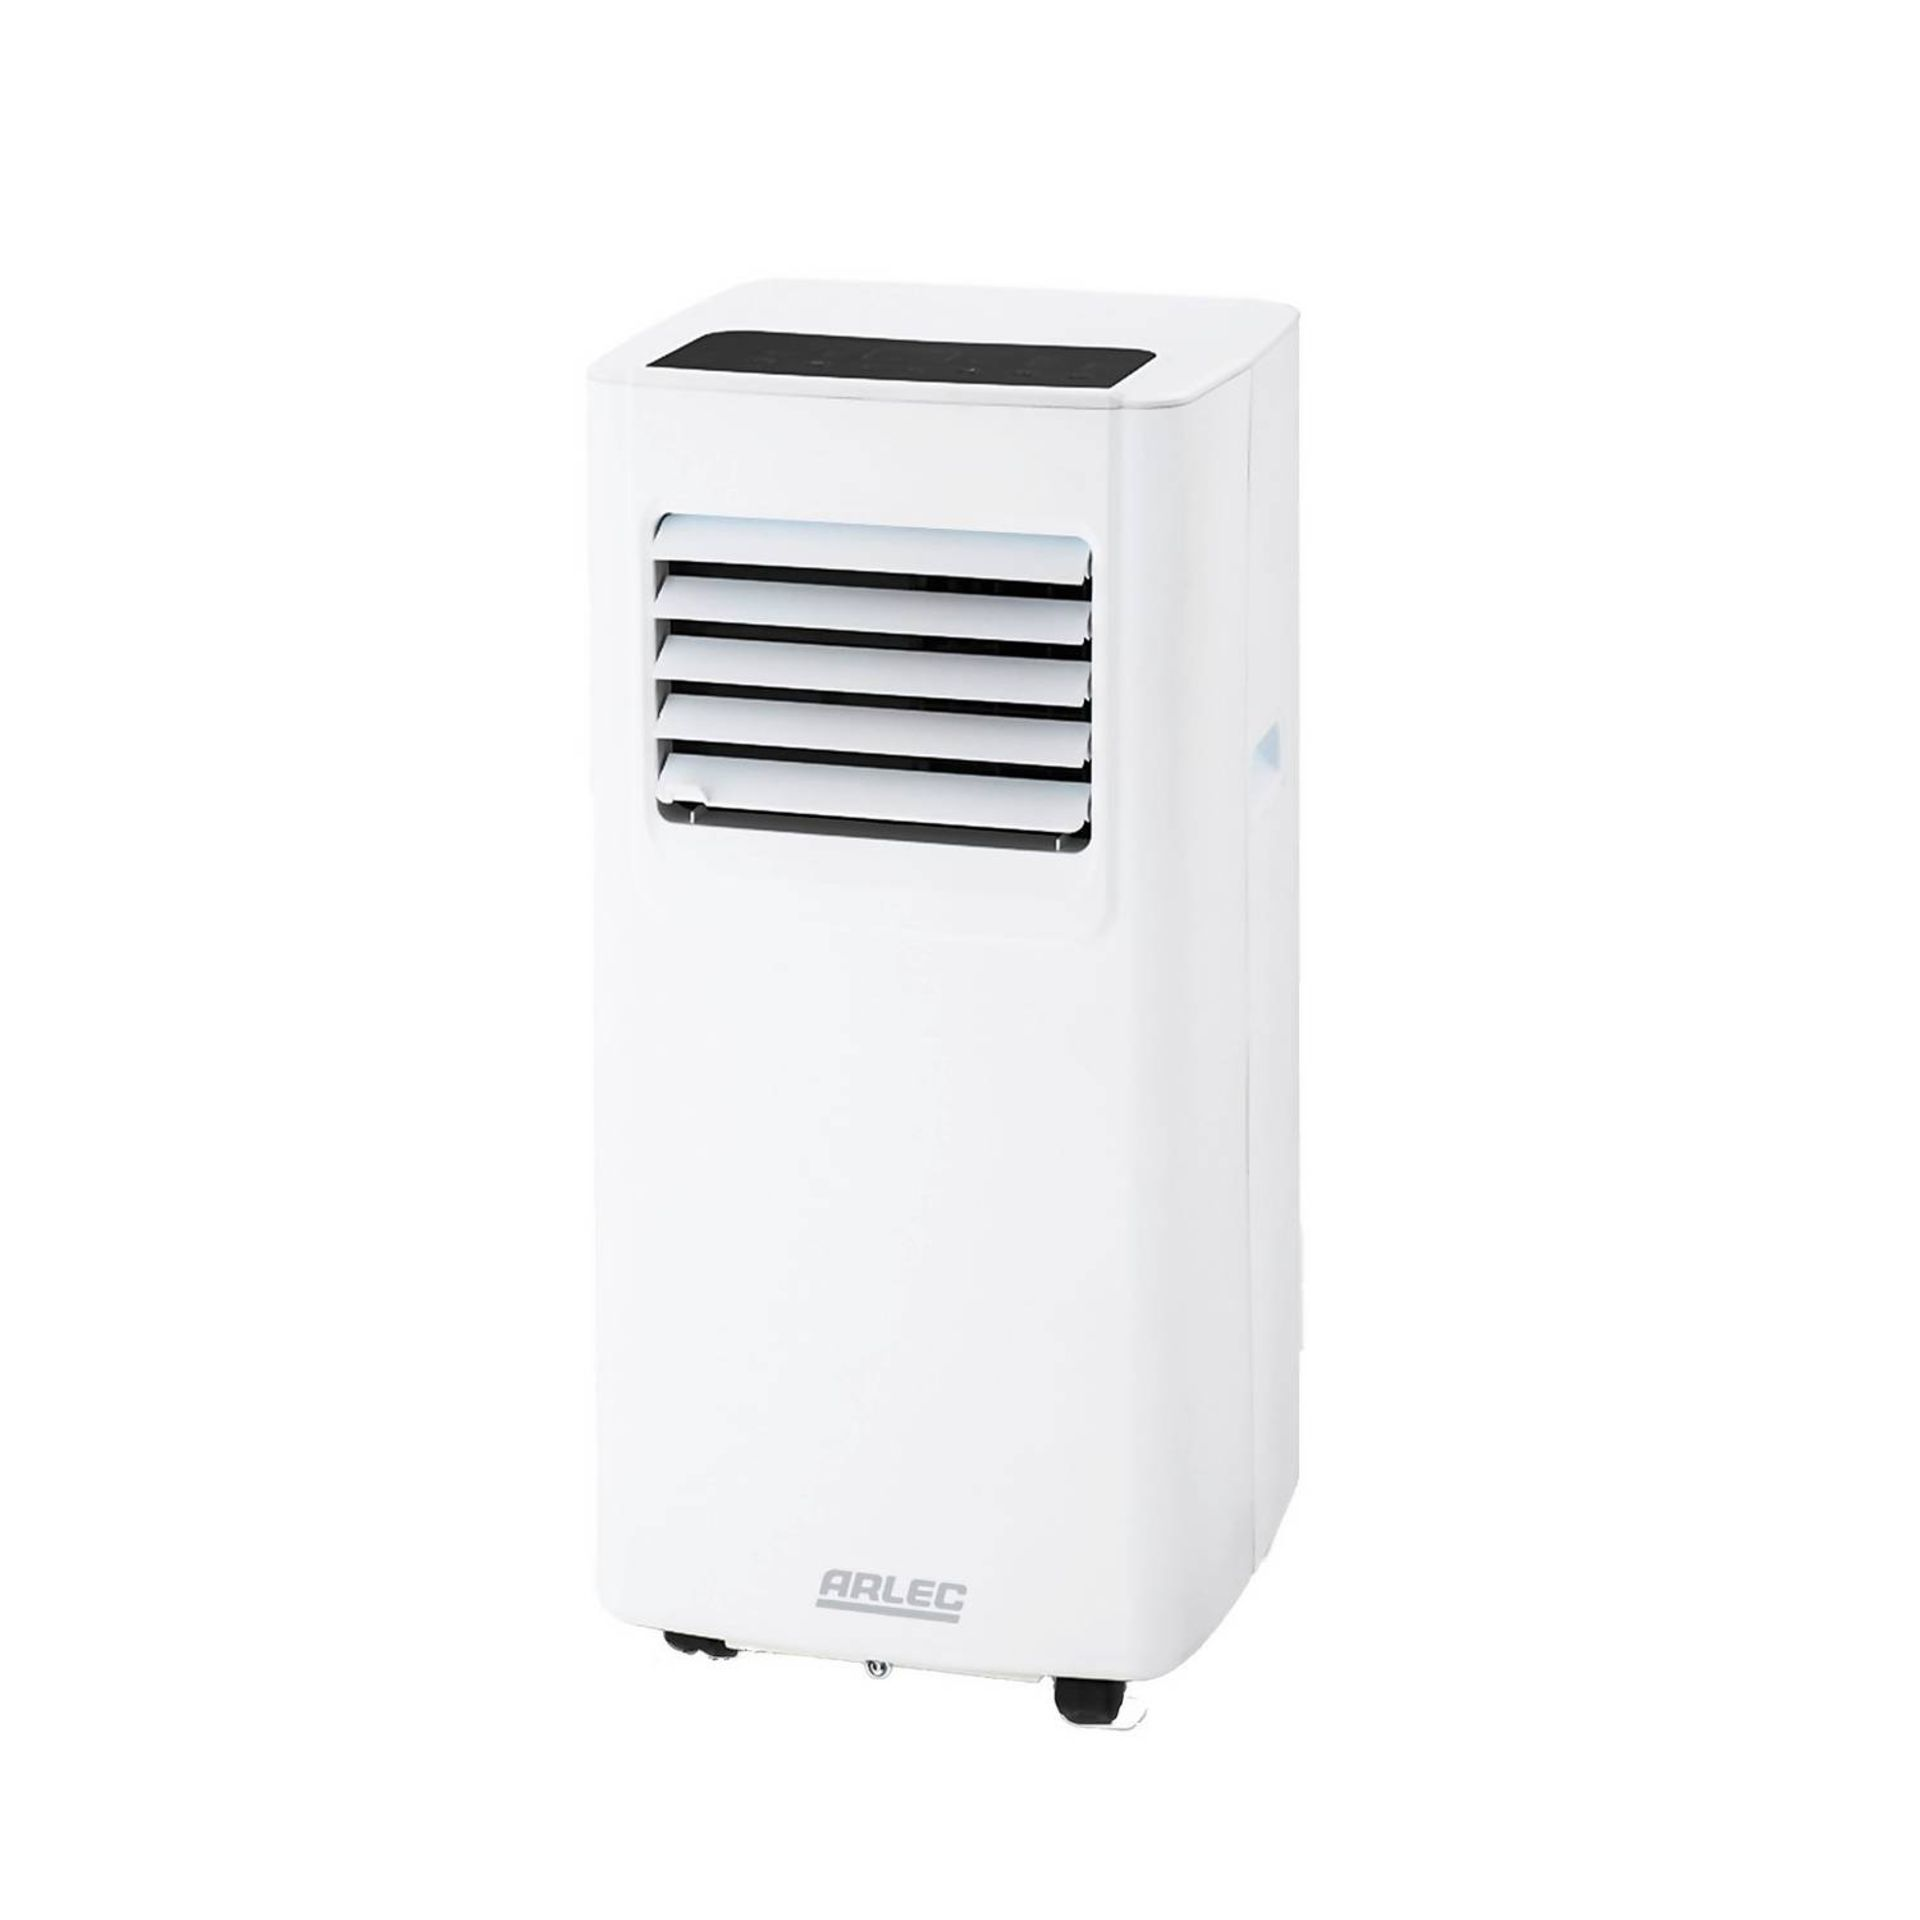 (P2) 1x Arlec Portable Air Conditioner 5000 BTU/h. RRP £300.00. - Image 2 of 3